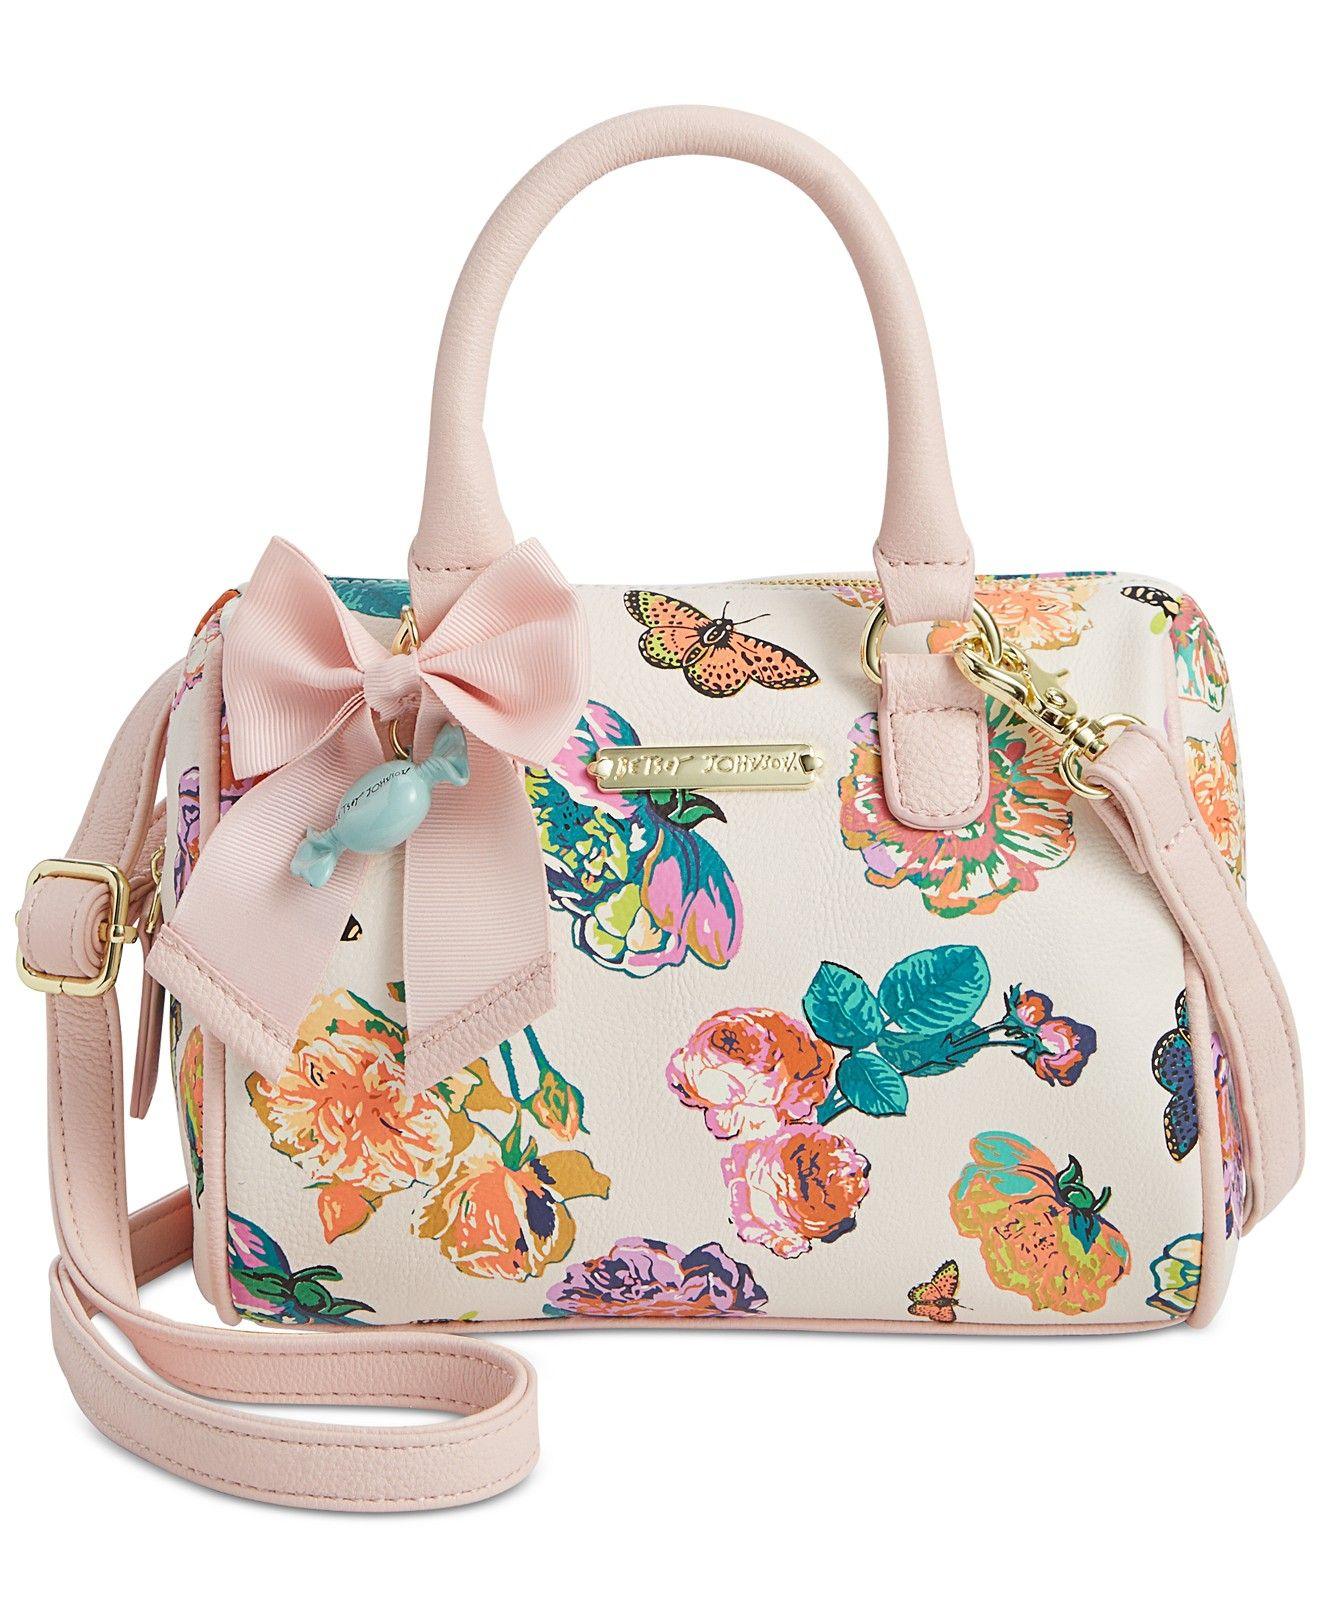 c5ab5b1b5 Betsey Johnson Mini Barrel Crossbody - Handbags & Accessories - Macy's